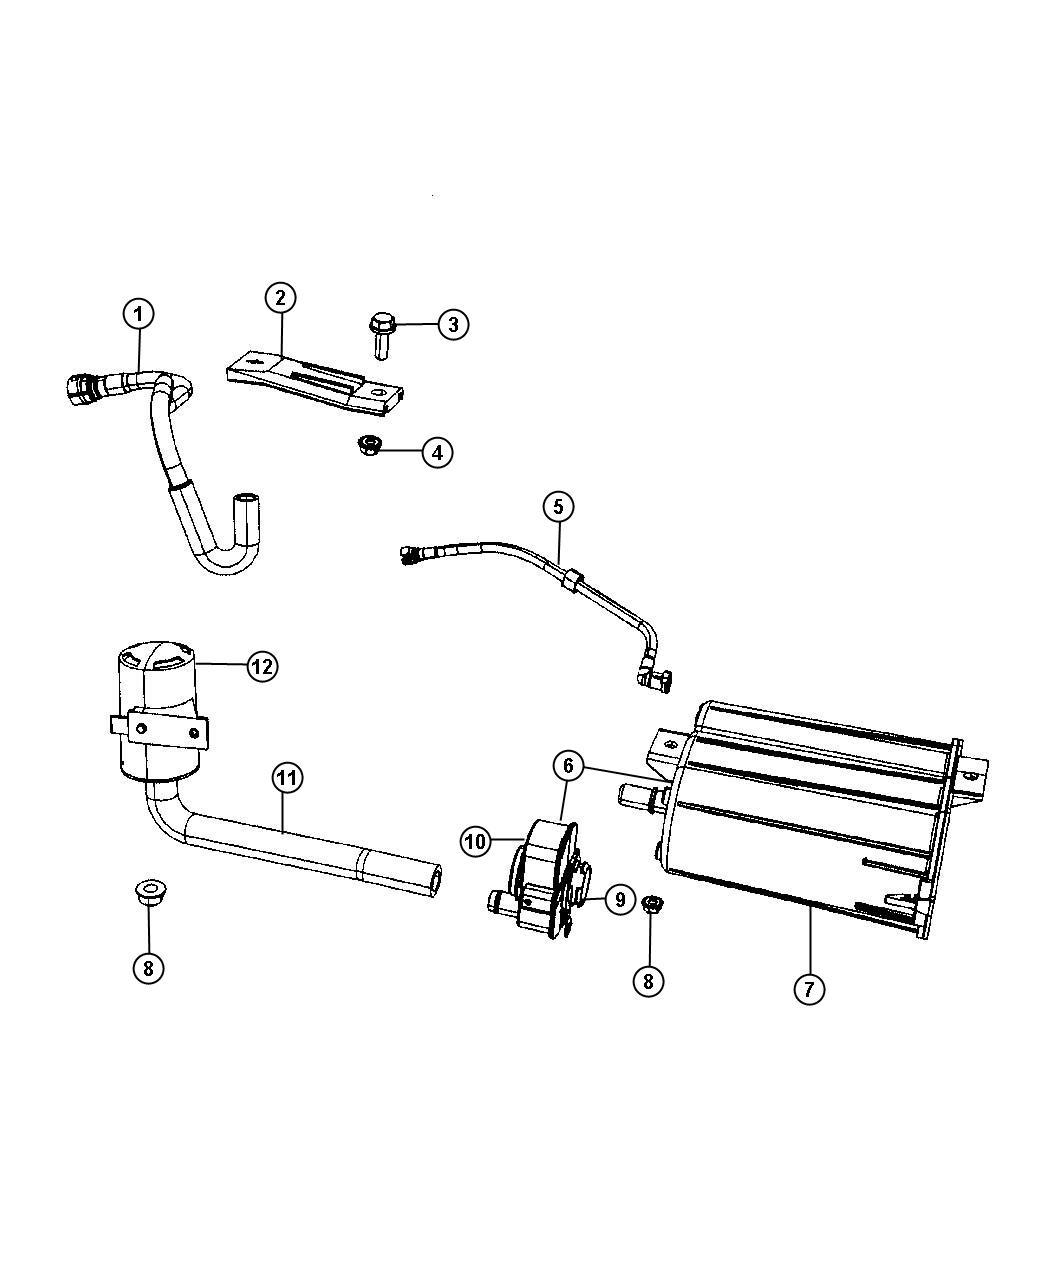 Jeep Filter Leak Detection Pump Assembly W Cap